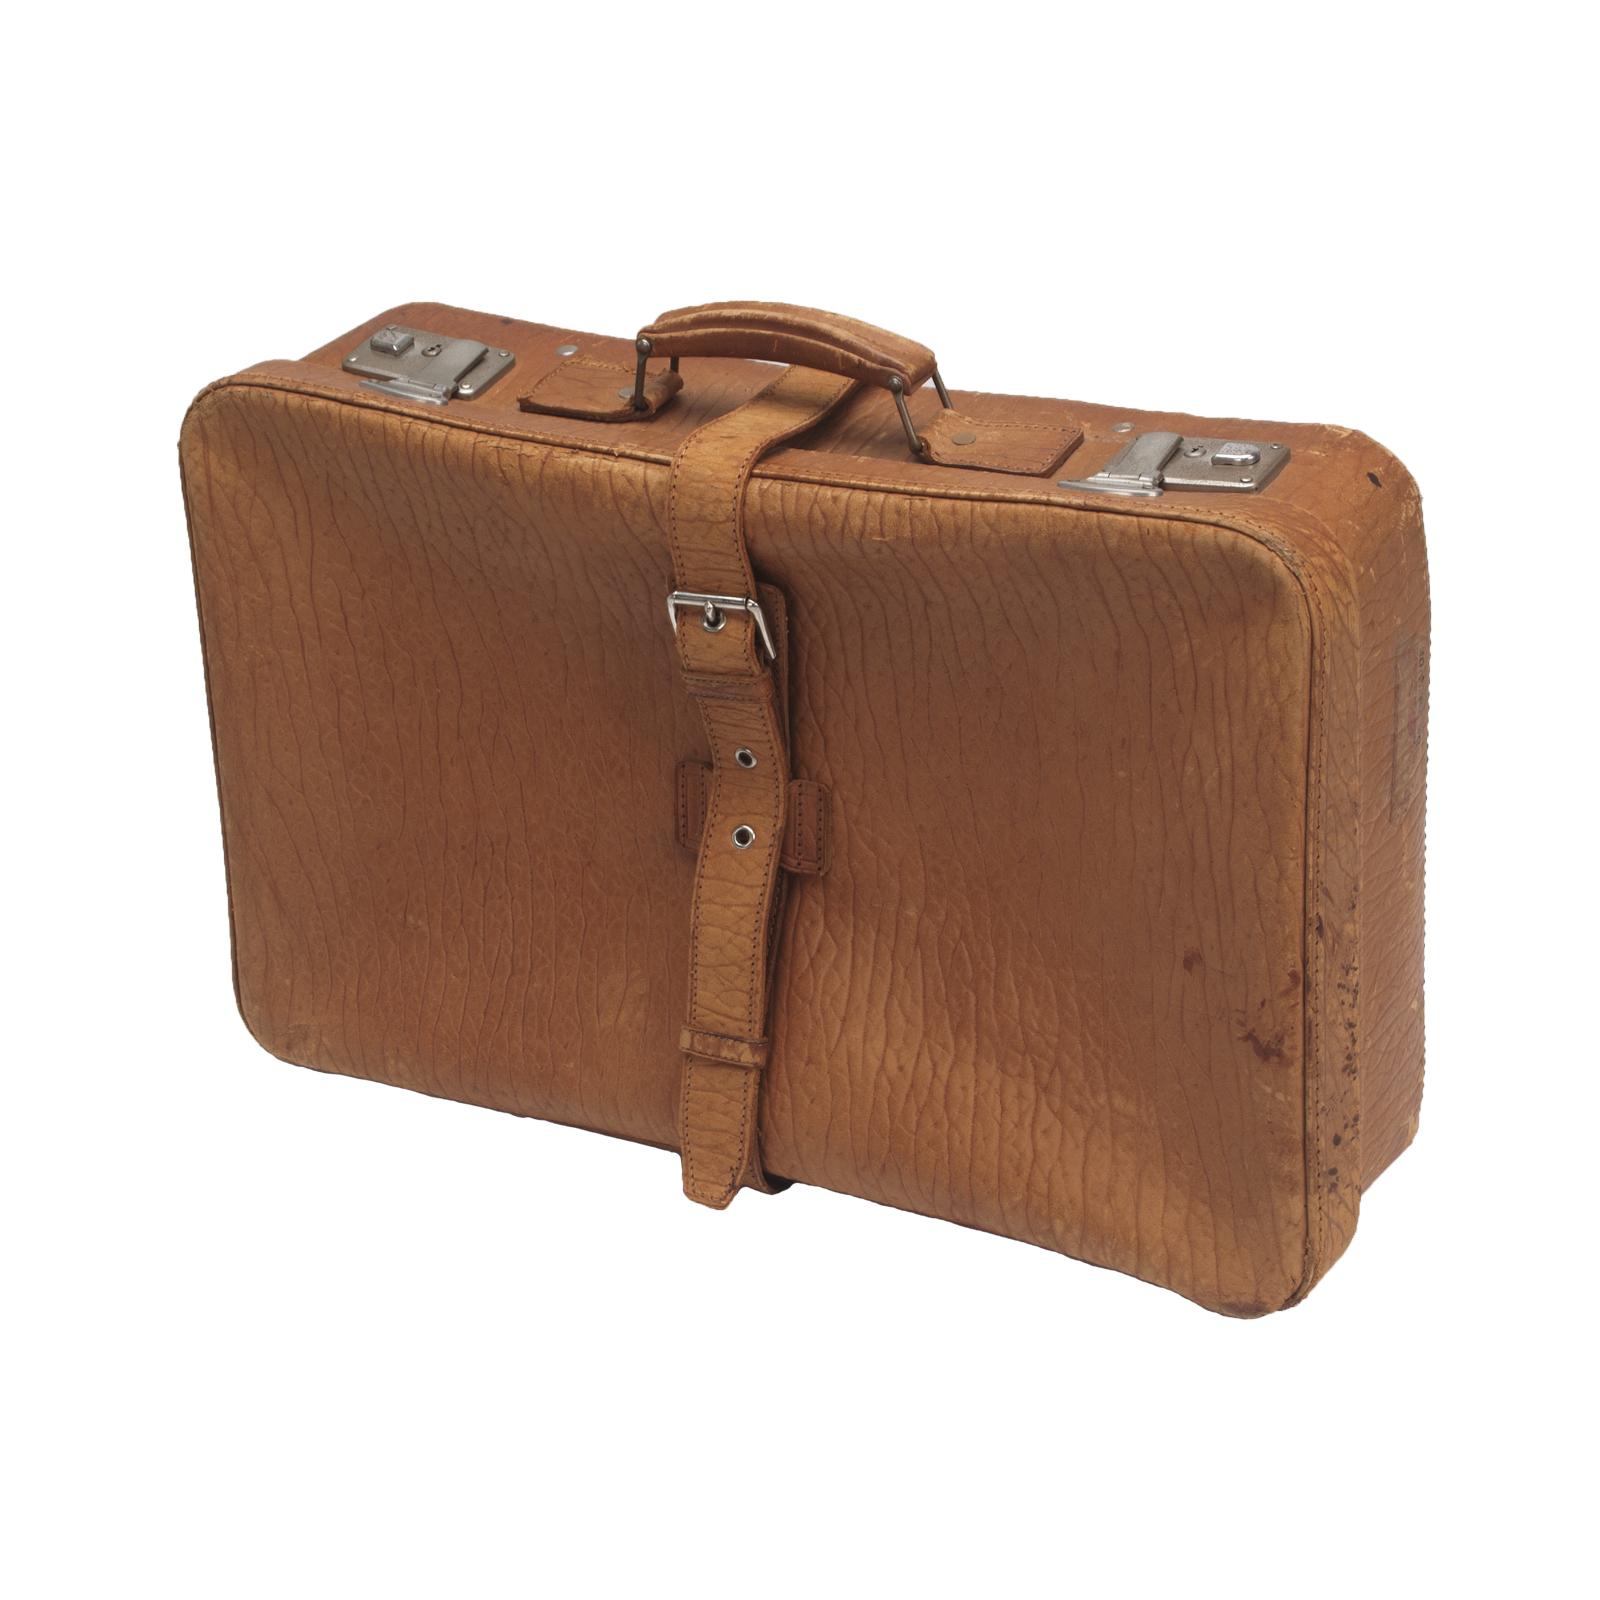 Luggage Decor Rental Event Furniture Rental